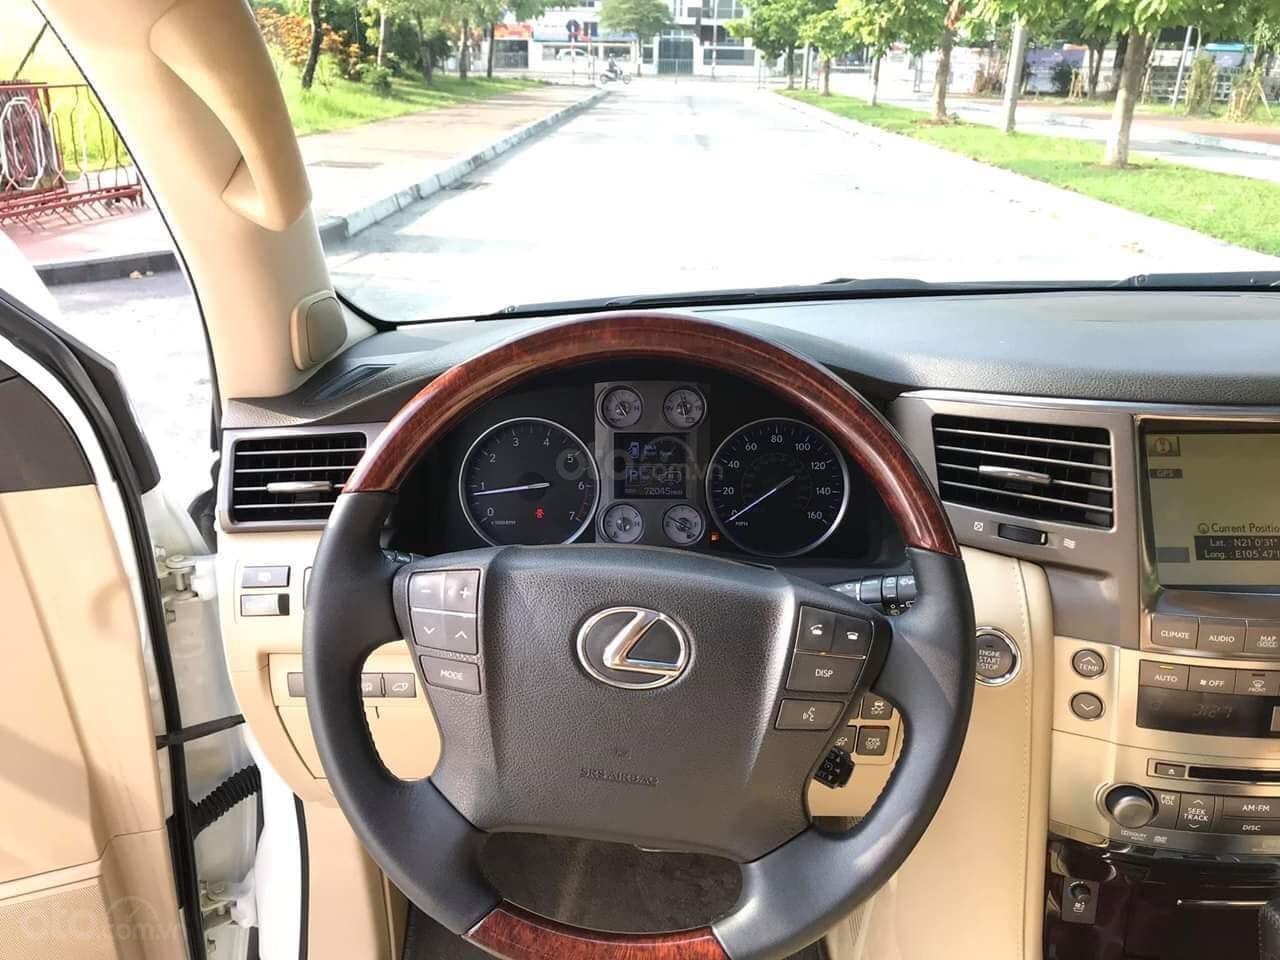 Giao ngay giao ngay Lexus LX570 trắng kem 2010 nhập Mỹ uy tín giá tốt (4)